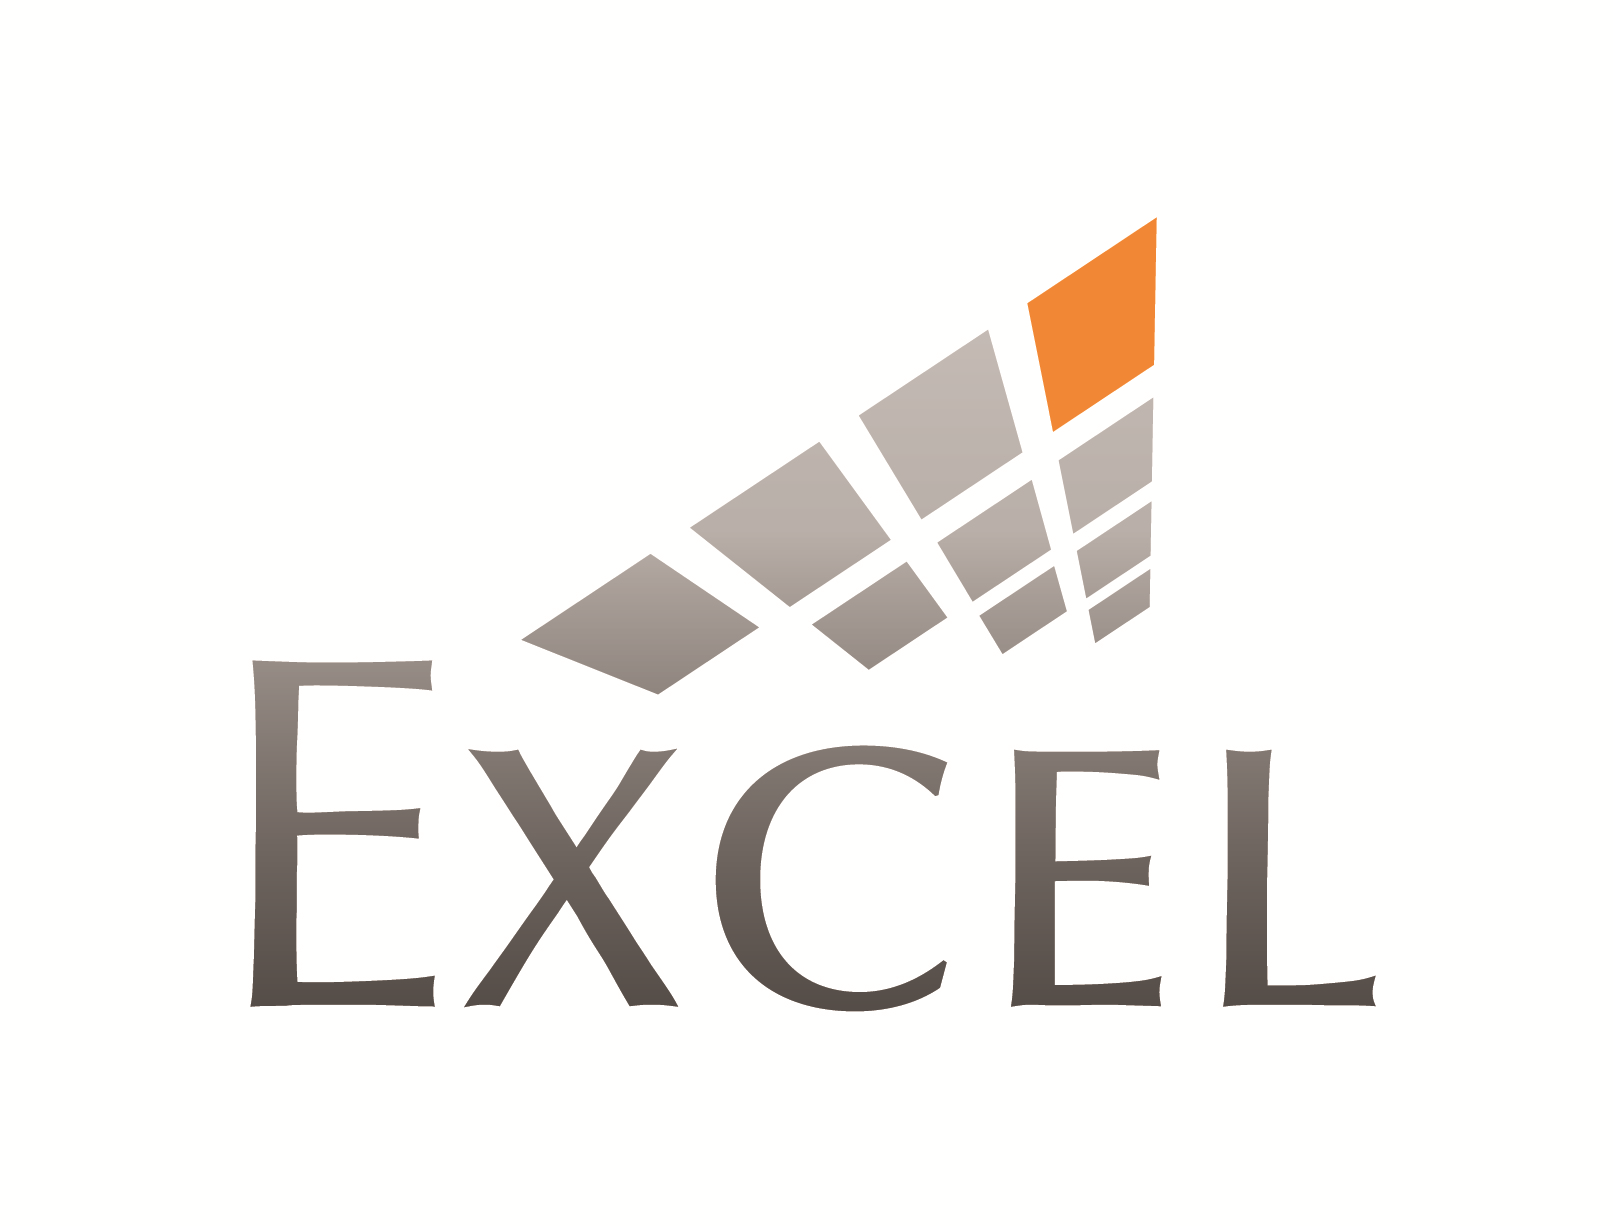 Excel Engineering, Inc. logo